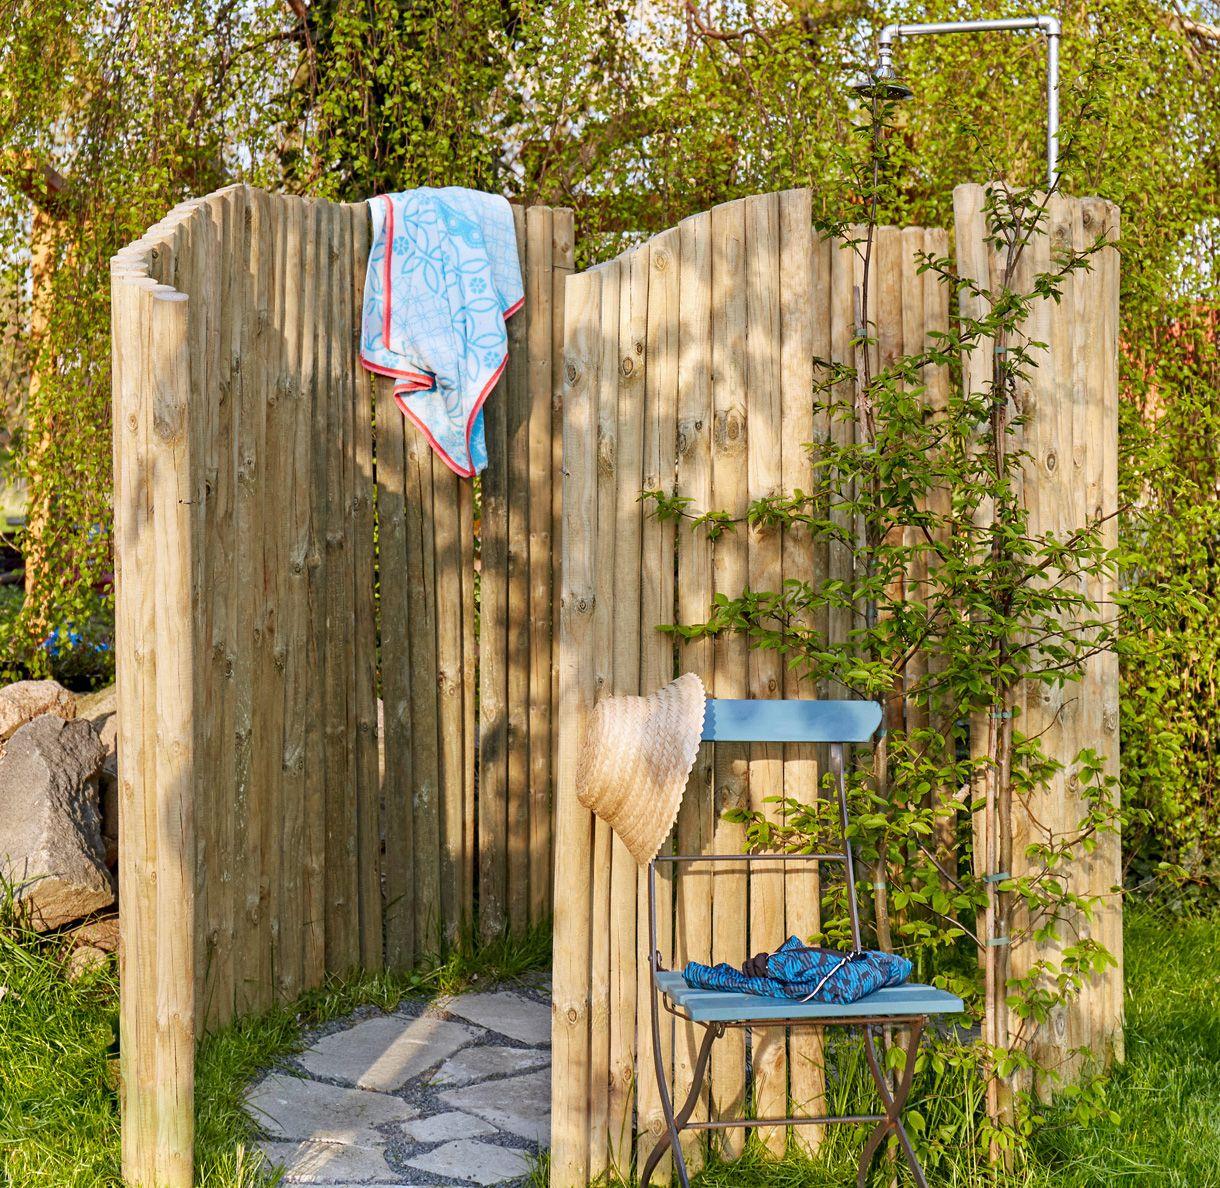 cr er une douche de jardin rafraichir plein air et douches. Black Bedroom Furniture Sets. Home Design Ideas